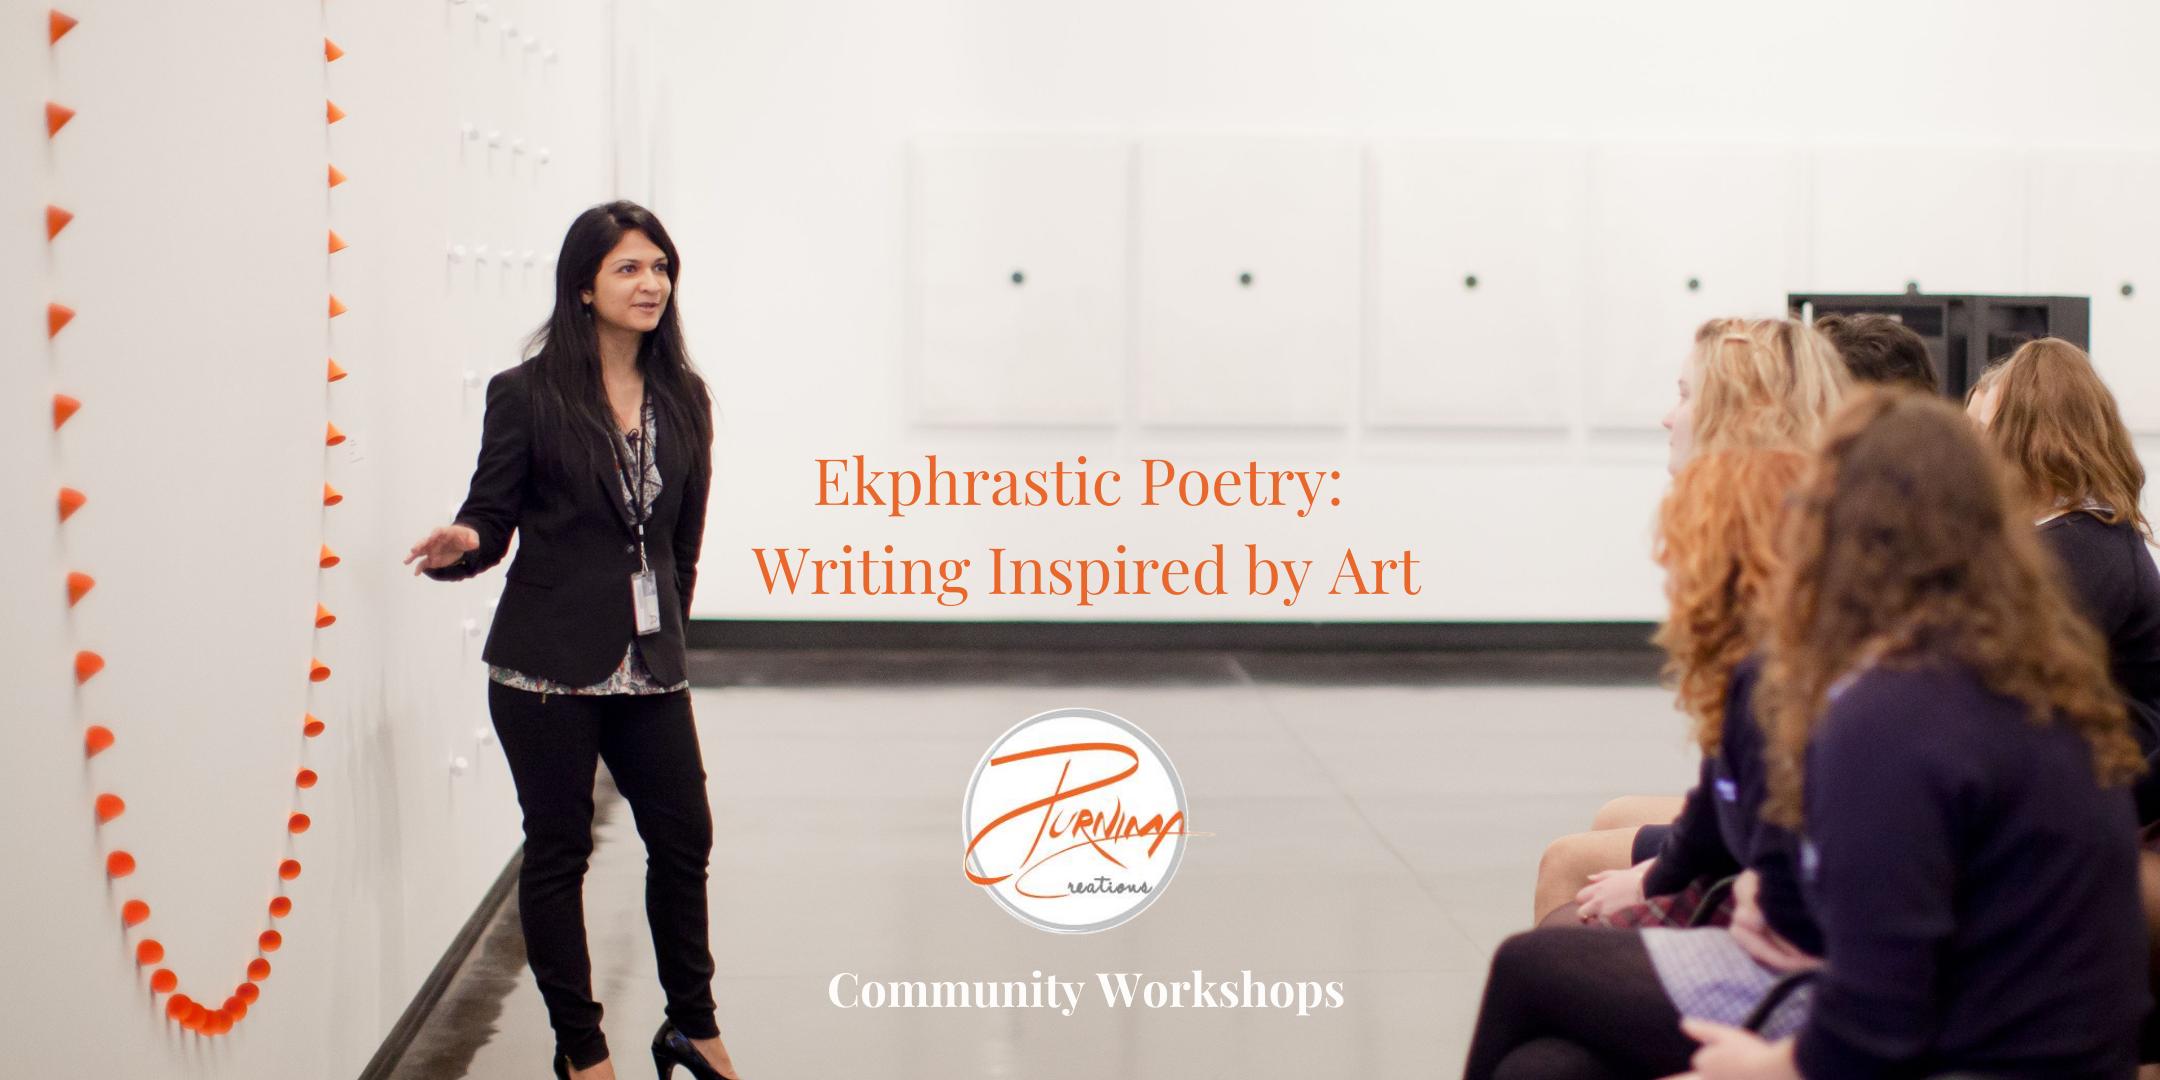 Ekphrastic Poetry: Writing Inspired by Art with Purnima Ghogar